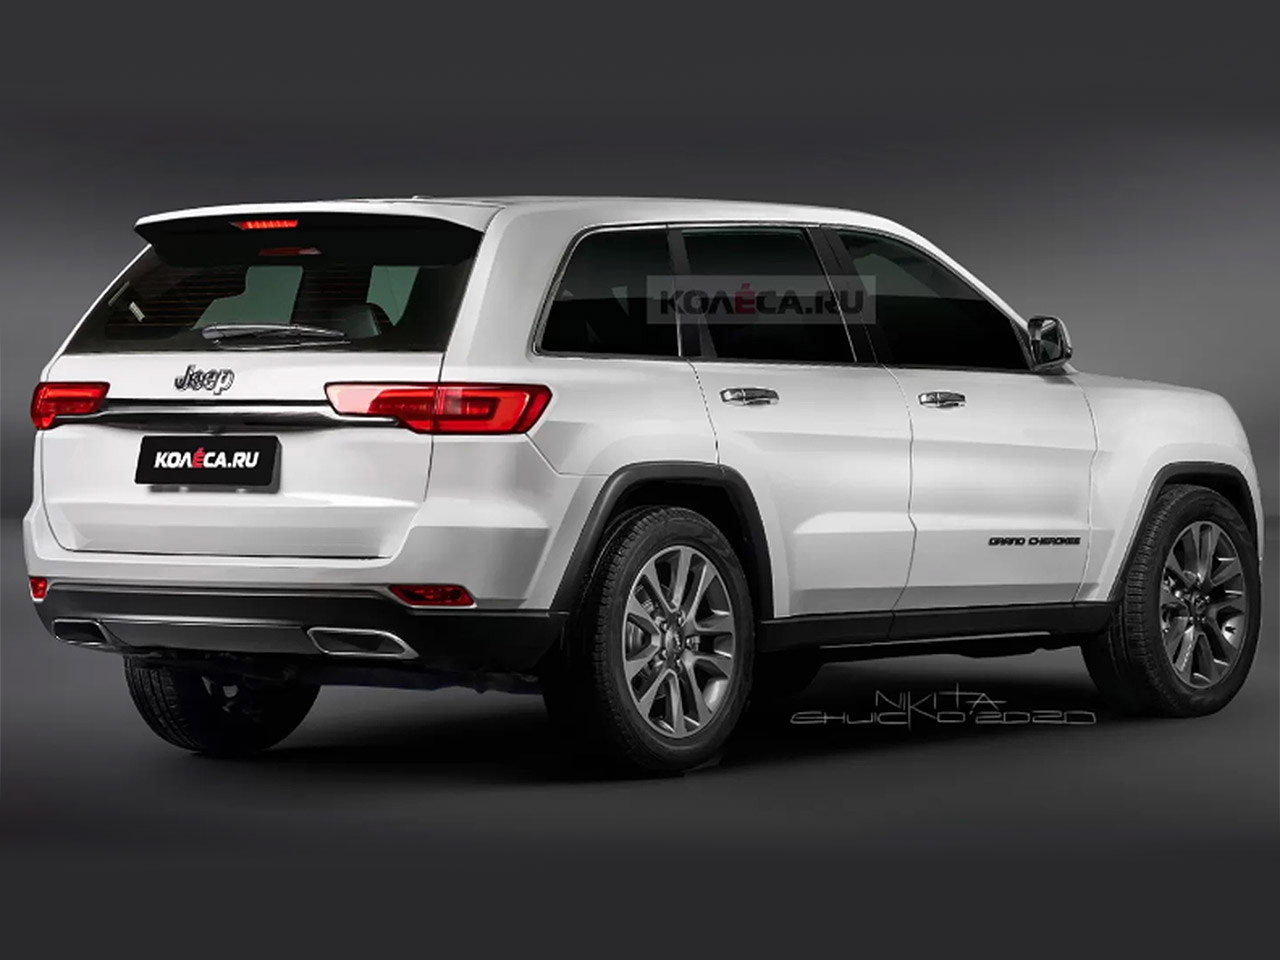 Jeep Grand Cherokee 2021 Projeção Kolesa Rússia 1